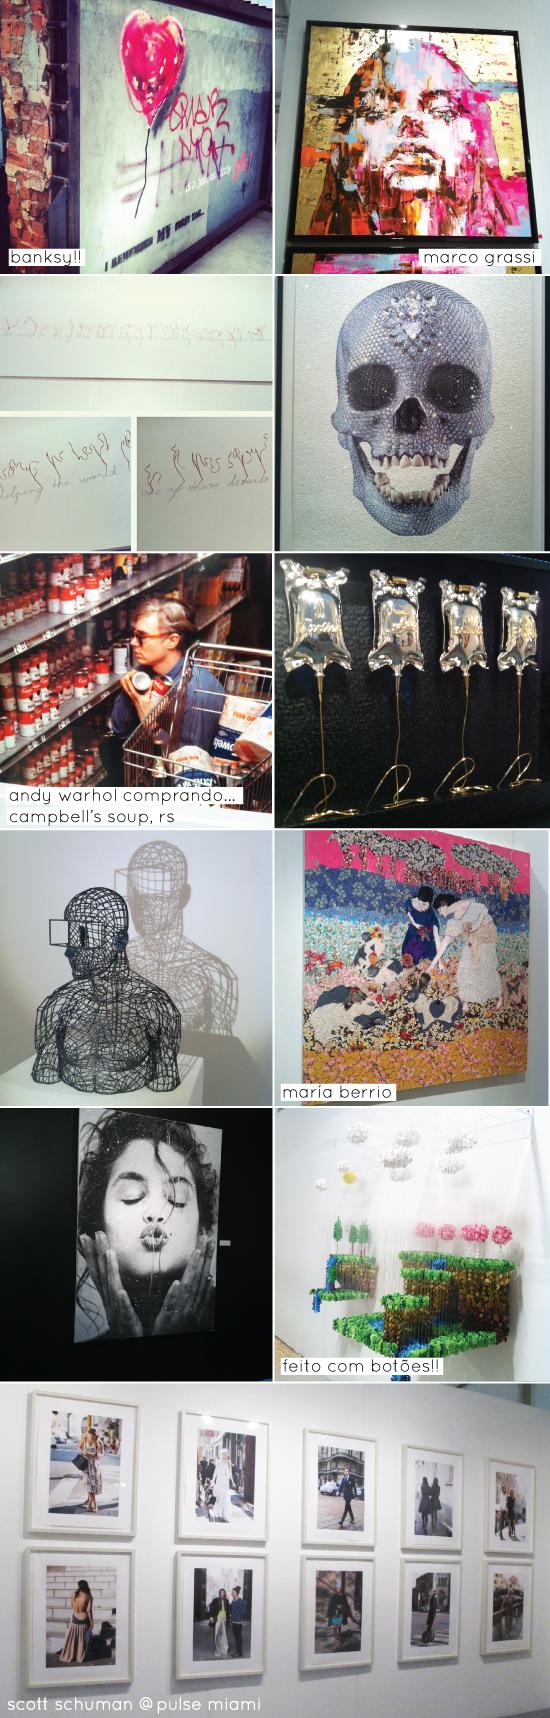 ART-BASEL-miami-2013-art-arte-feita-galerias-blog-dica-viagem-art-miami-banksy-street-art-modern-contemporary-andy-warhol